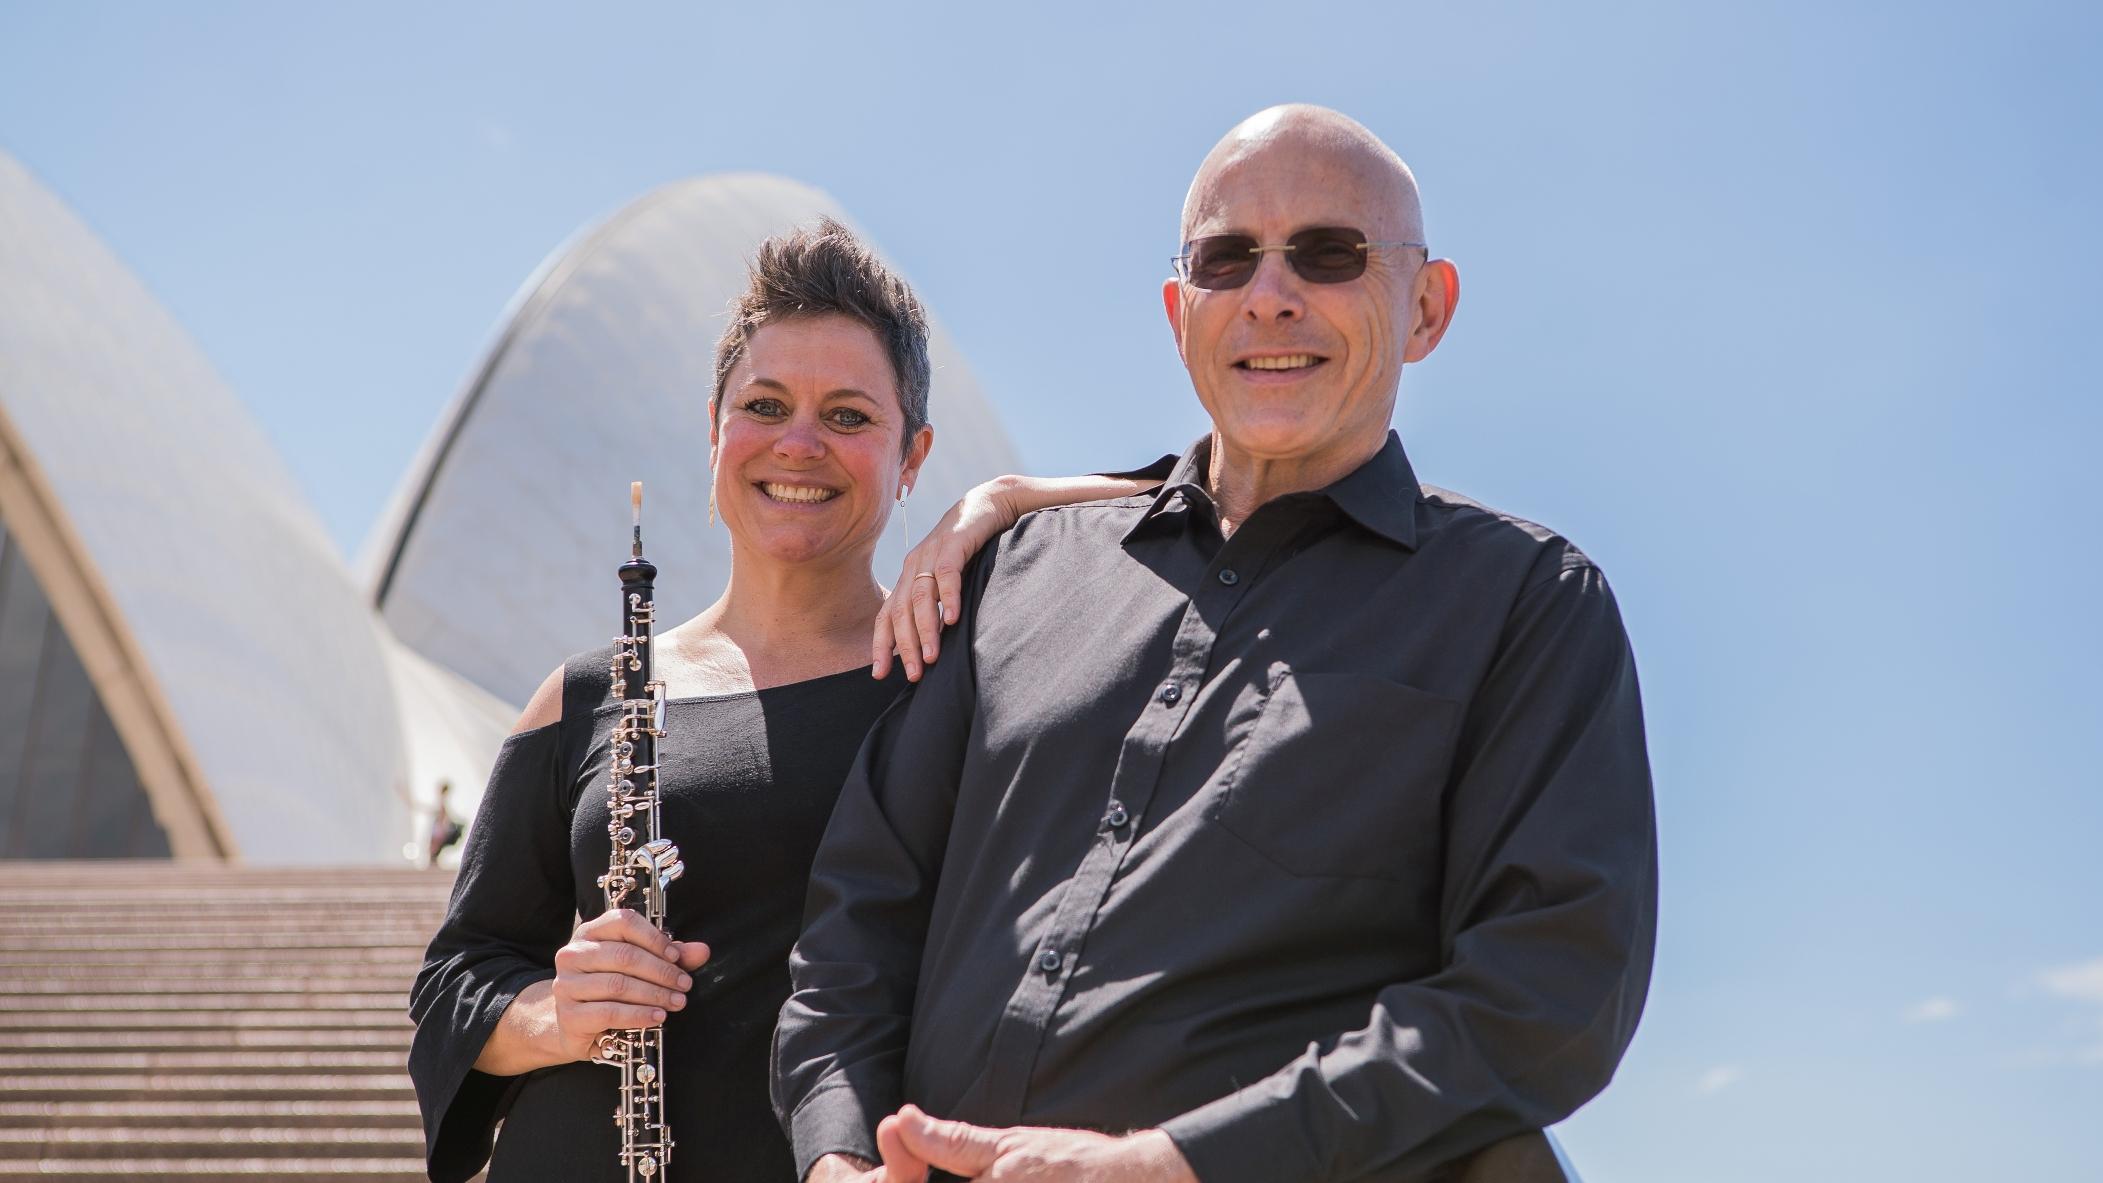 Diana Doherty and Composer Nigel Westlake